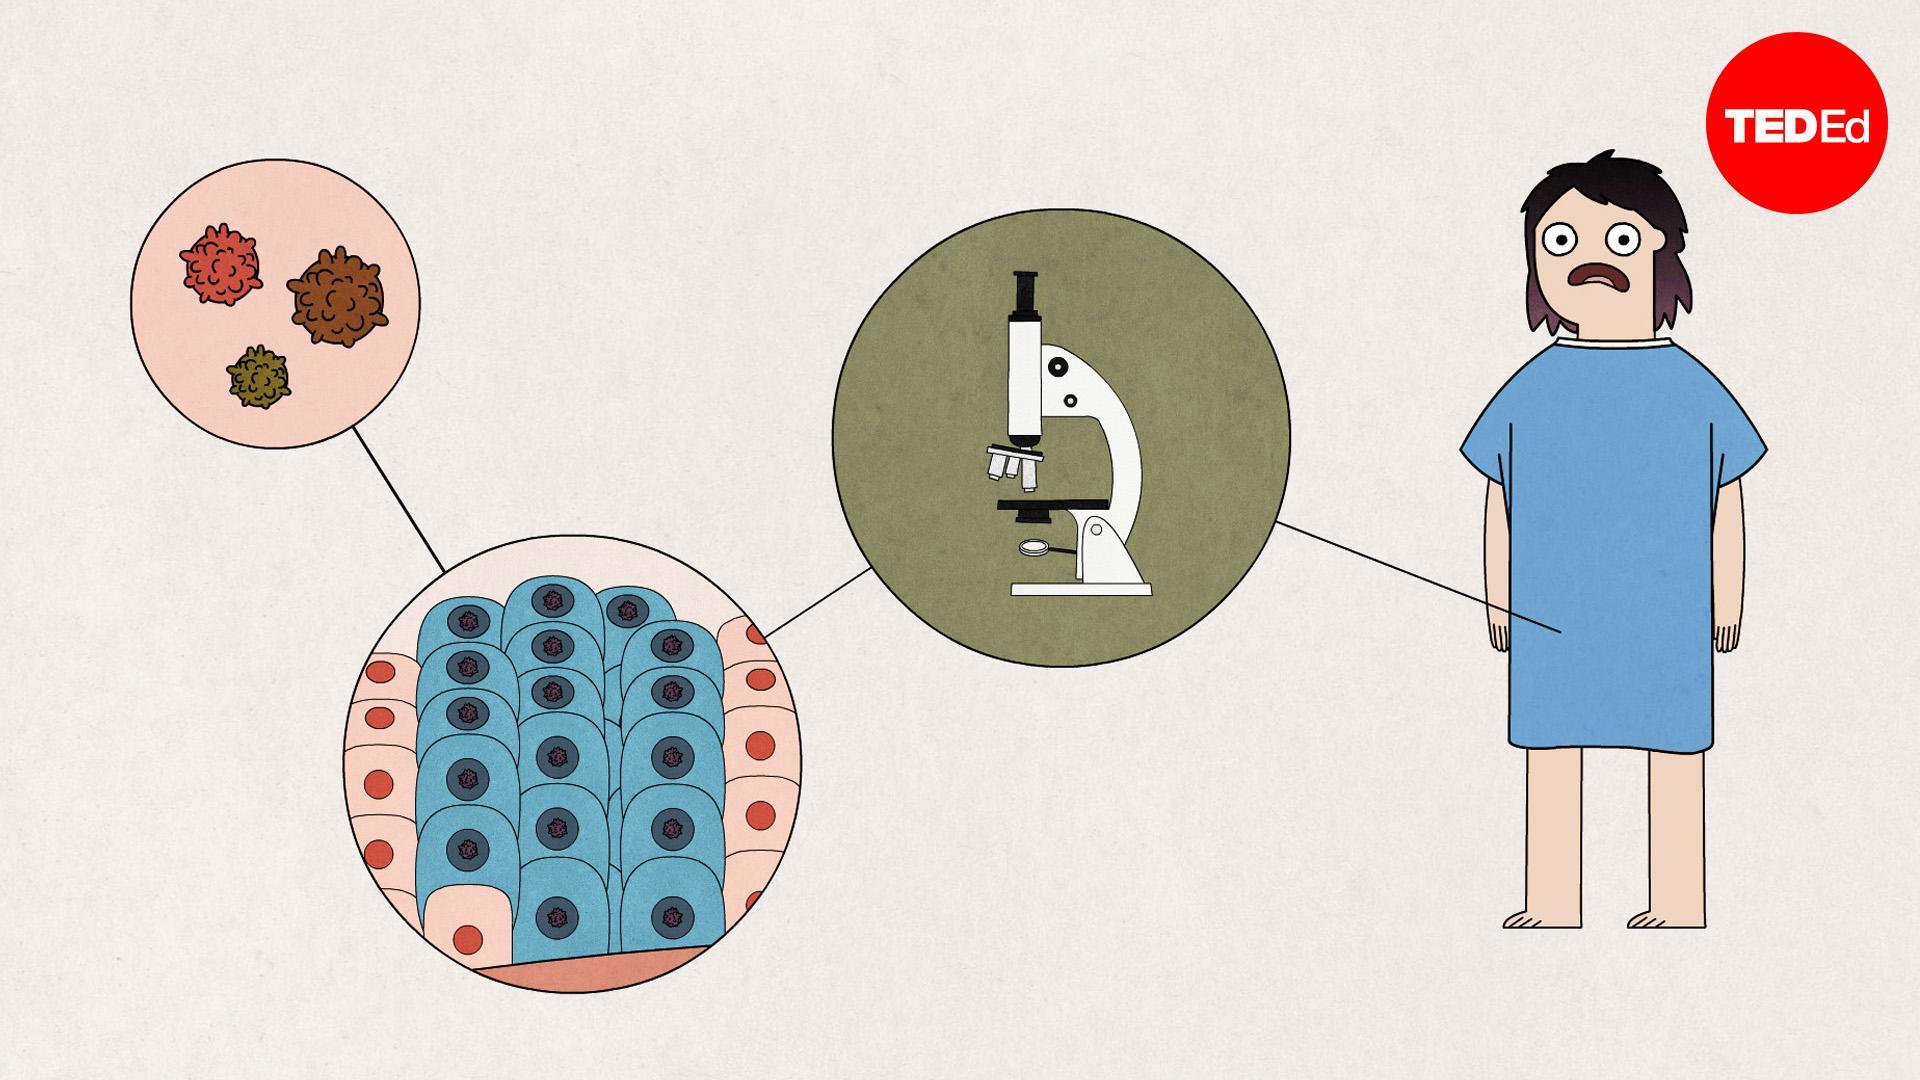 papilloma virus rimane per sempre